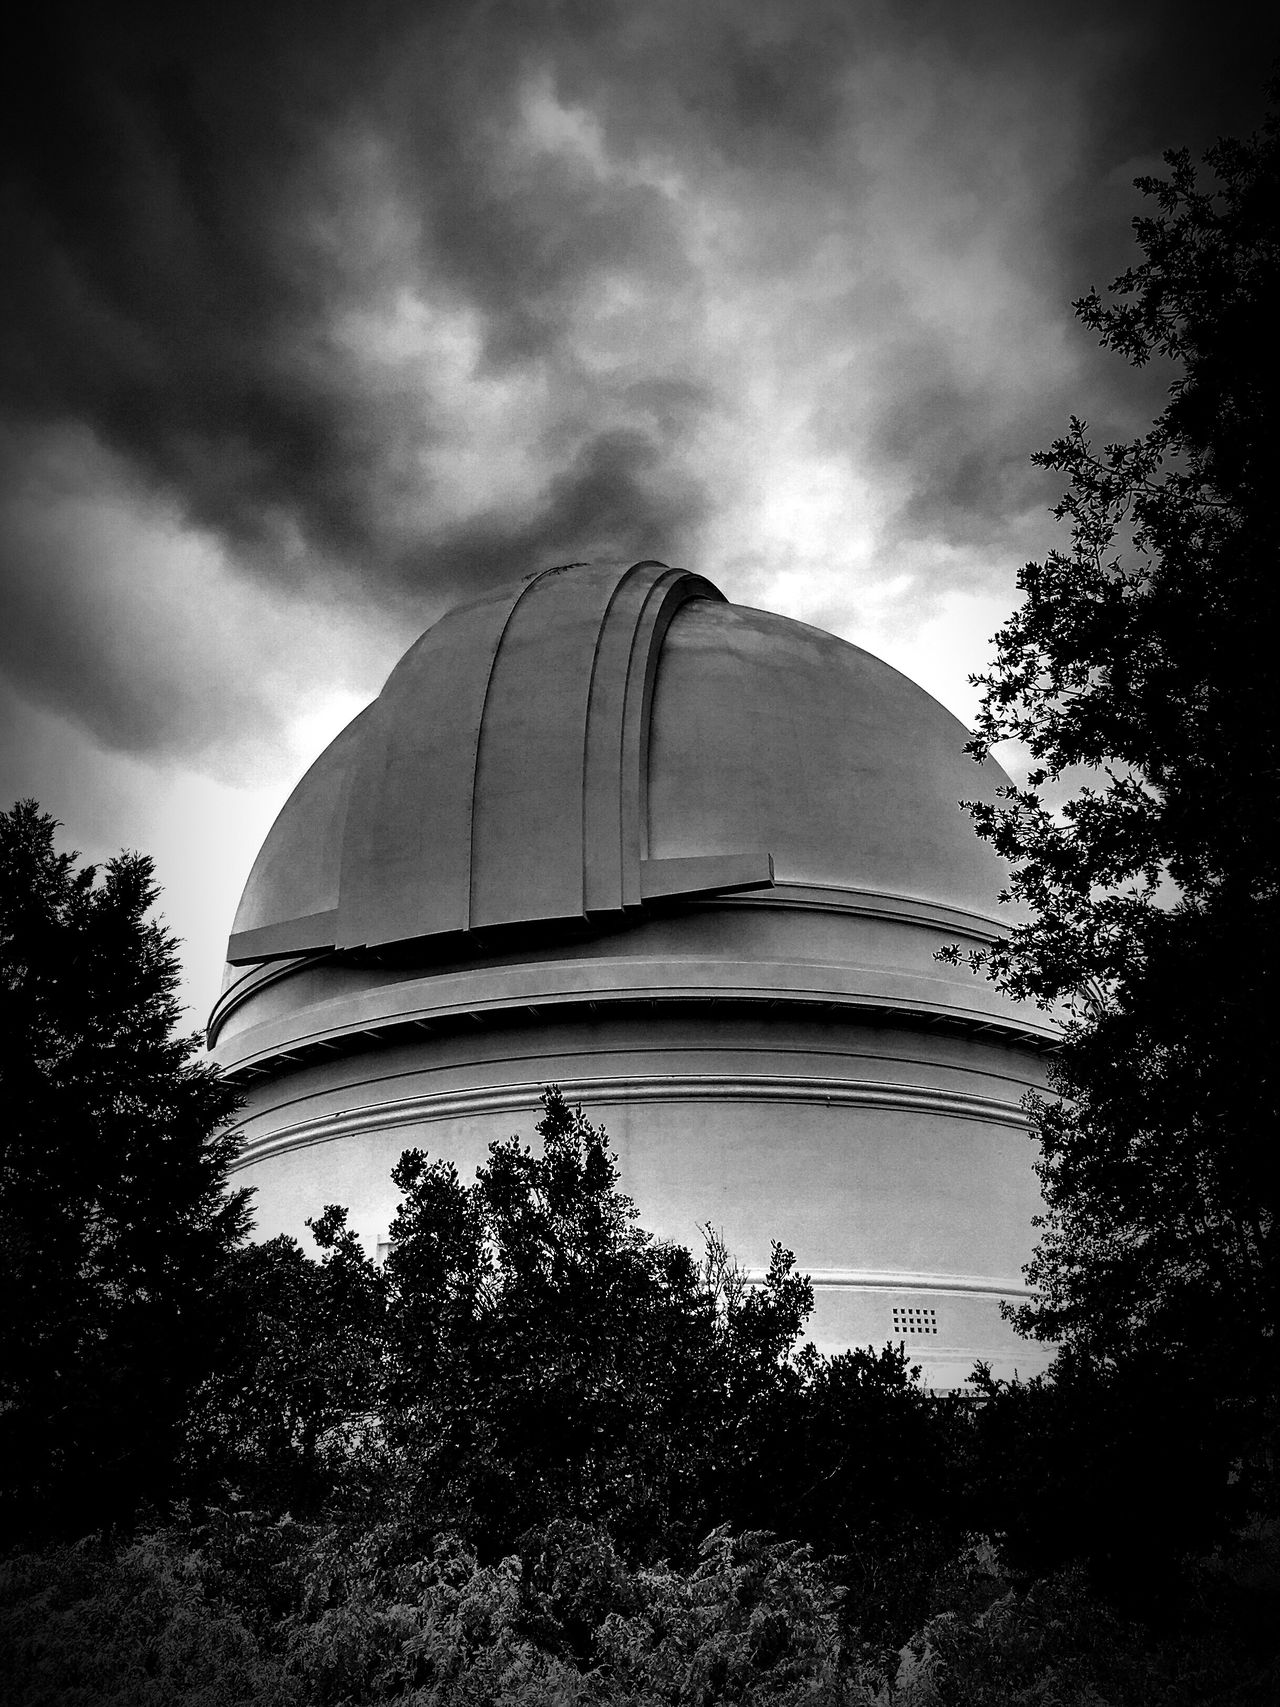 Palomar Palomar Observatory Blackandwhite Monochrome Mountain Melancholic Landscapes Sky